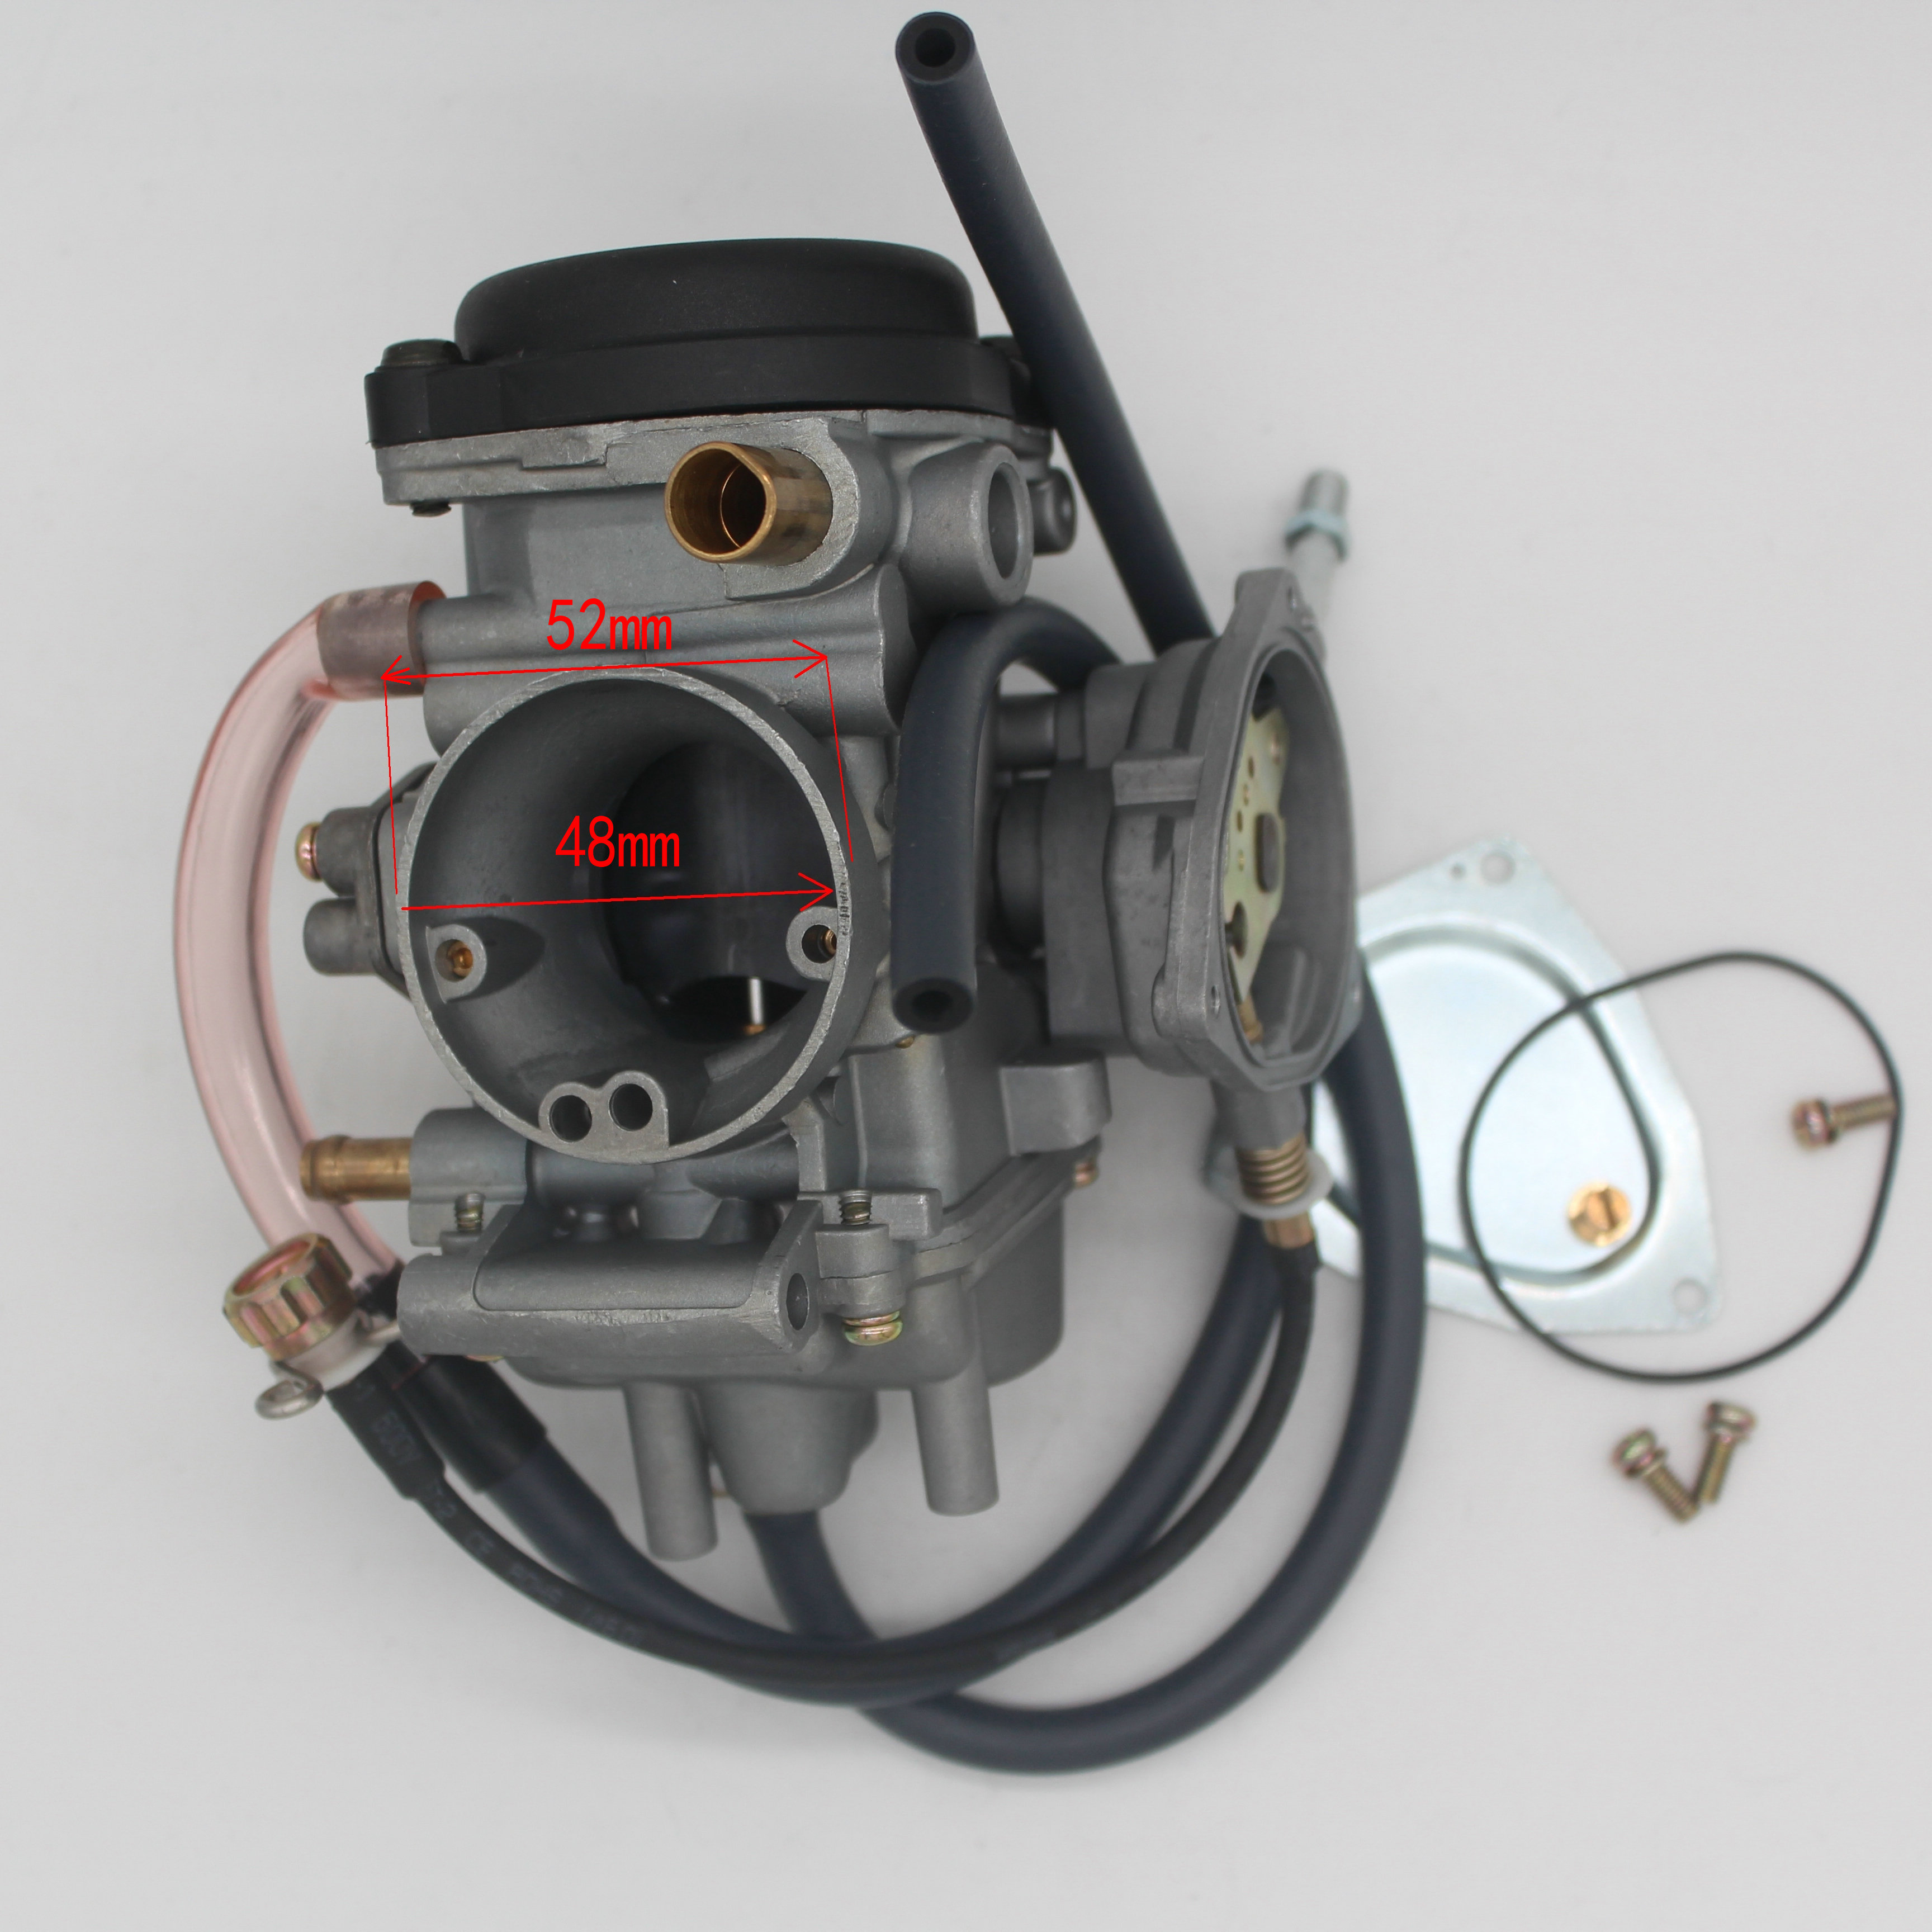 PD33J 33mm Motorcycle carburetor fit for YAMAHA KODIAK 450 YFM450 4X4 2003 2005 BRUIN 350 2WD